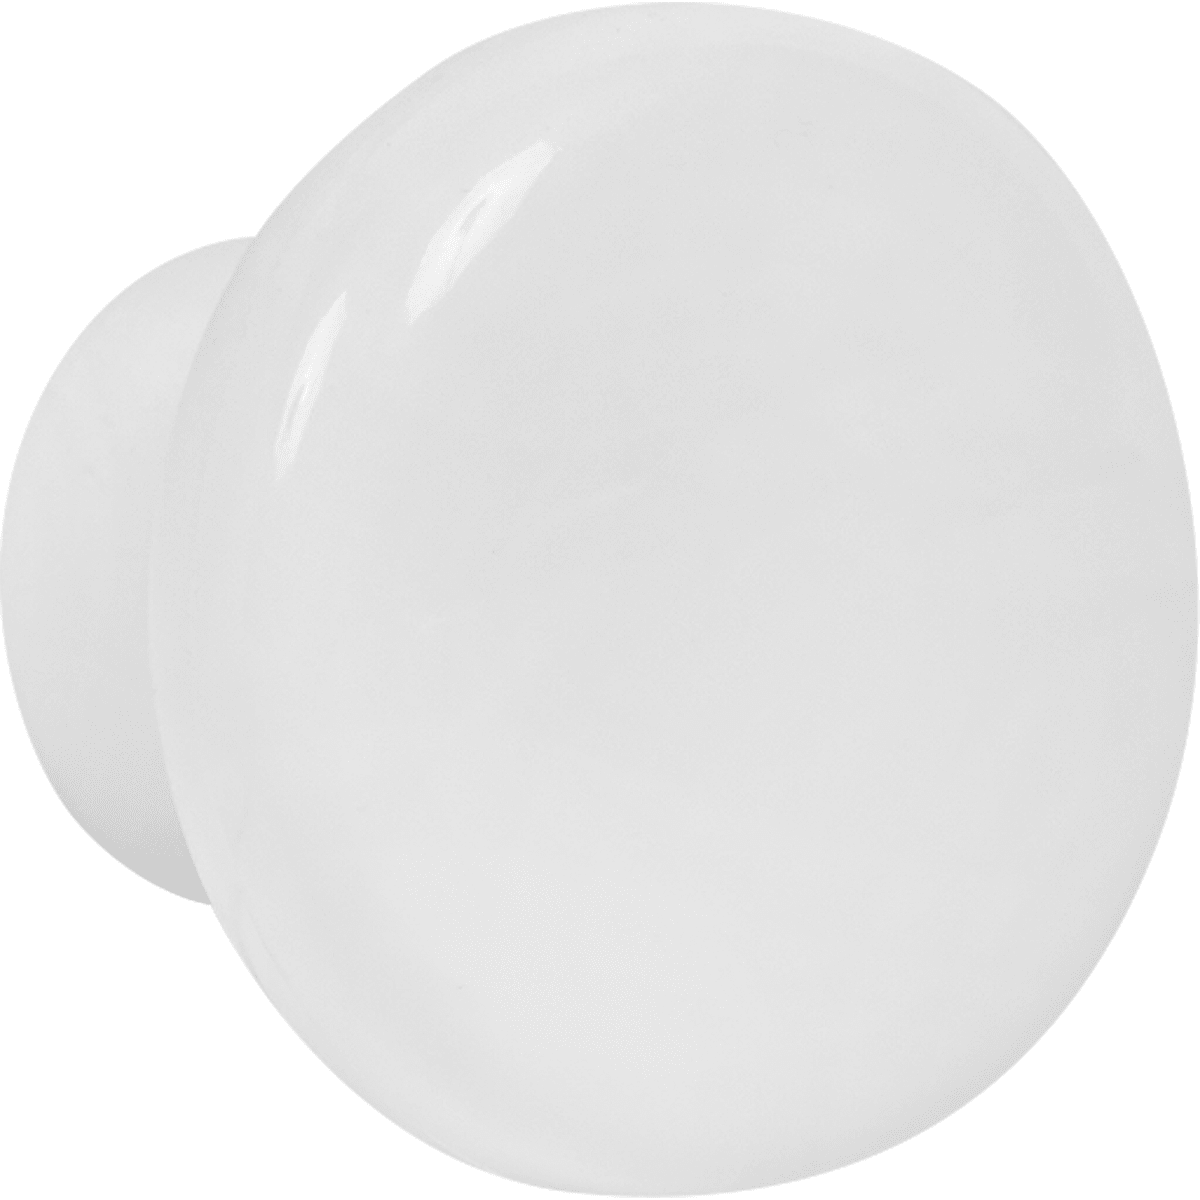 Ручка-кнопка пластик цвет белый